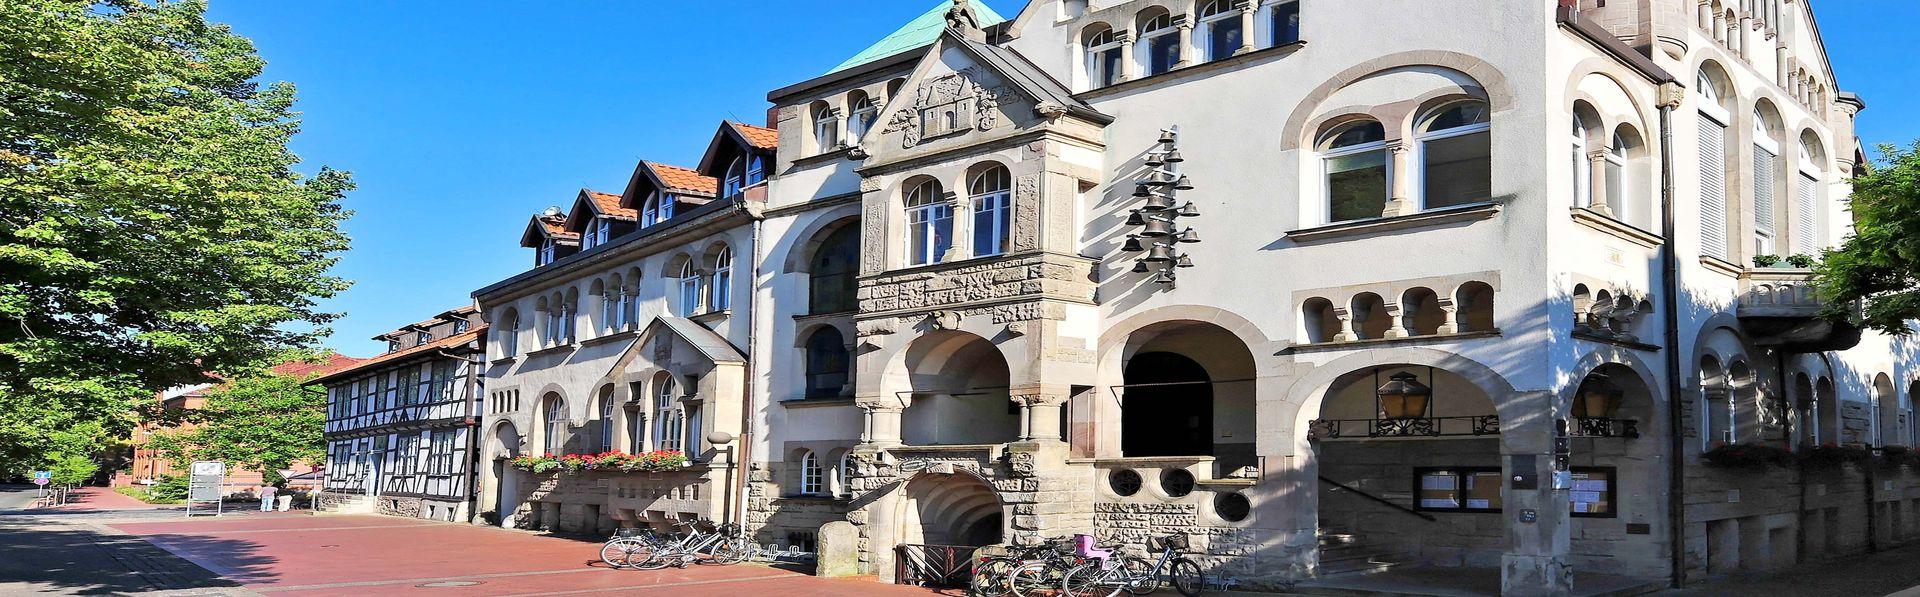 Rathaus & Politik 1